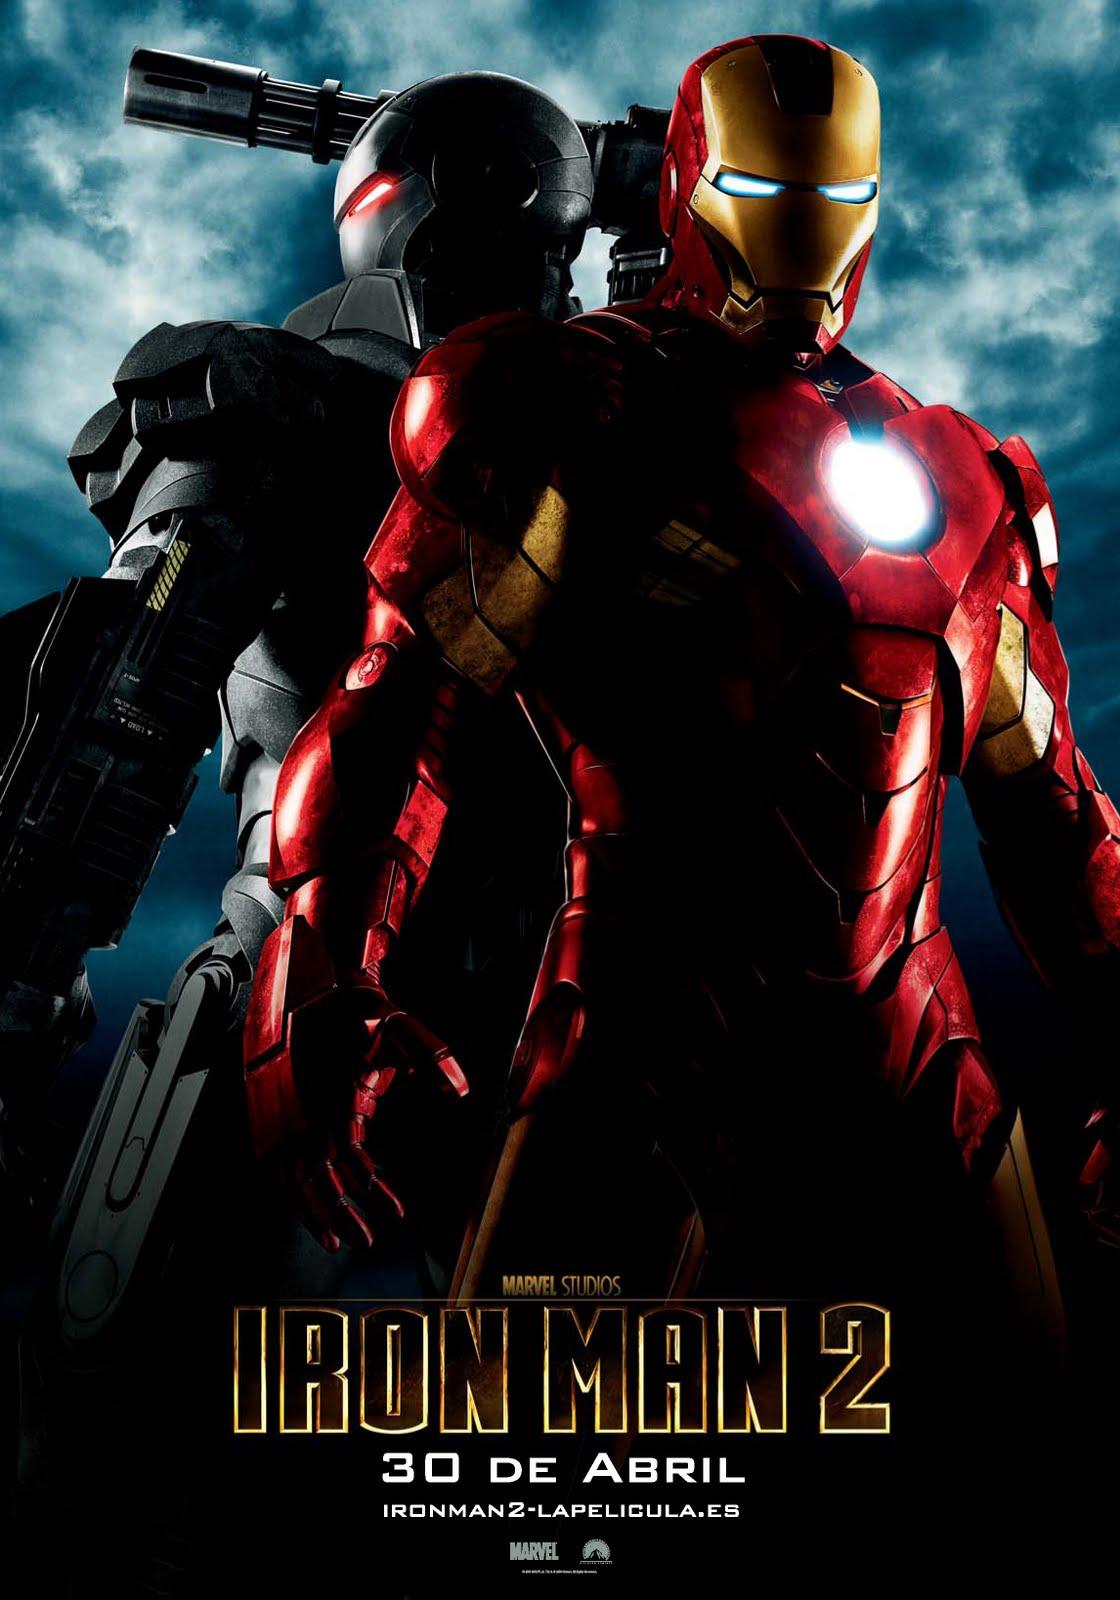 http://3.bp.blogspot.com/_fUhxxoBhouI/TLUtIgipmBI/AAAAAAAAGMU/eU-BR0WlFLI/s1600/Iron_Man_2_-_tt1228705_G.jpg